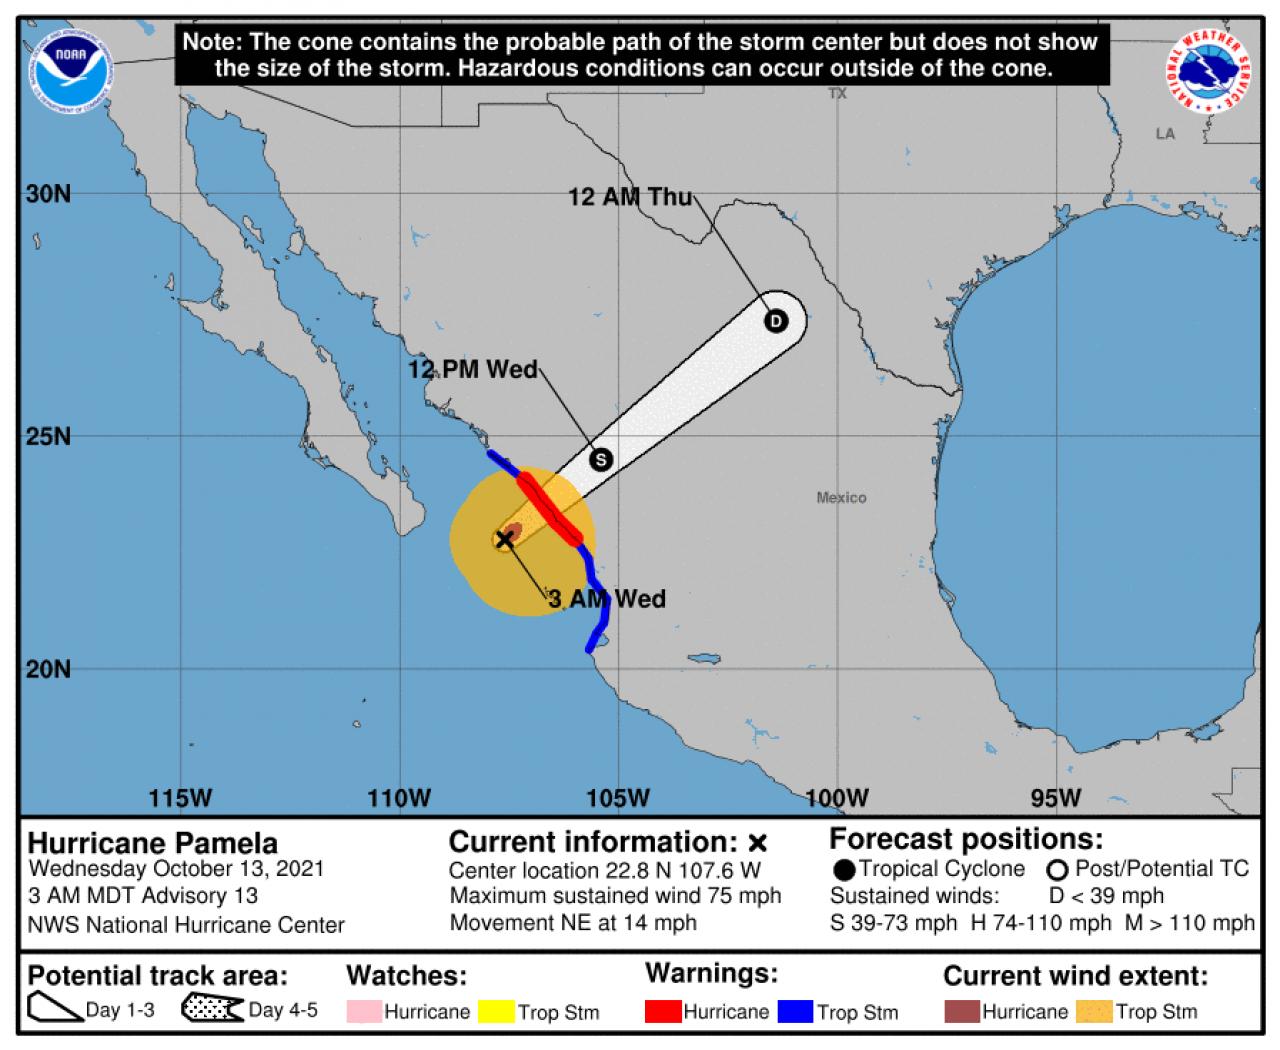 La rotta prevista di Pamela (Fonte: National Hurricane Center)